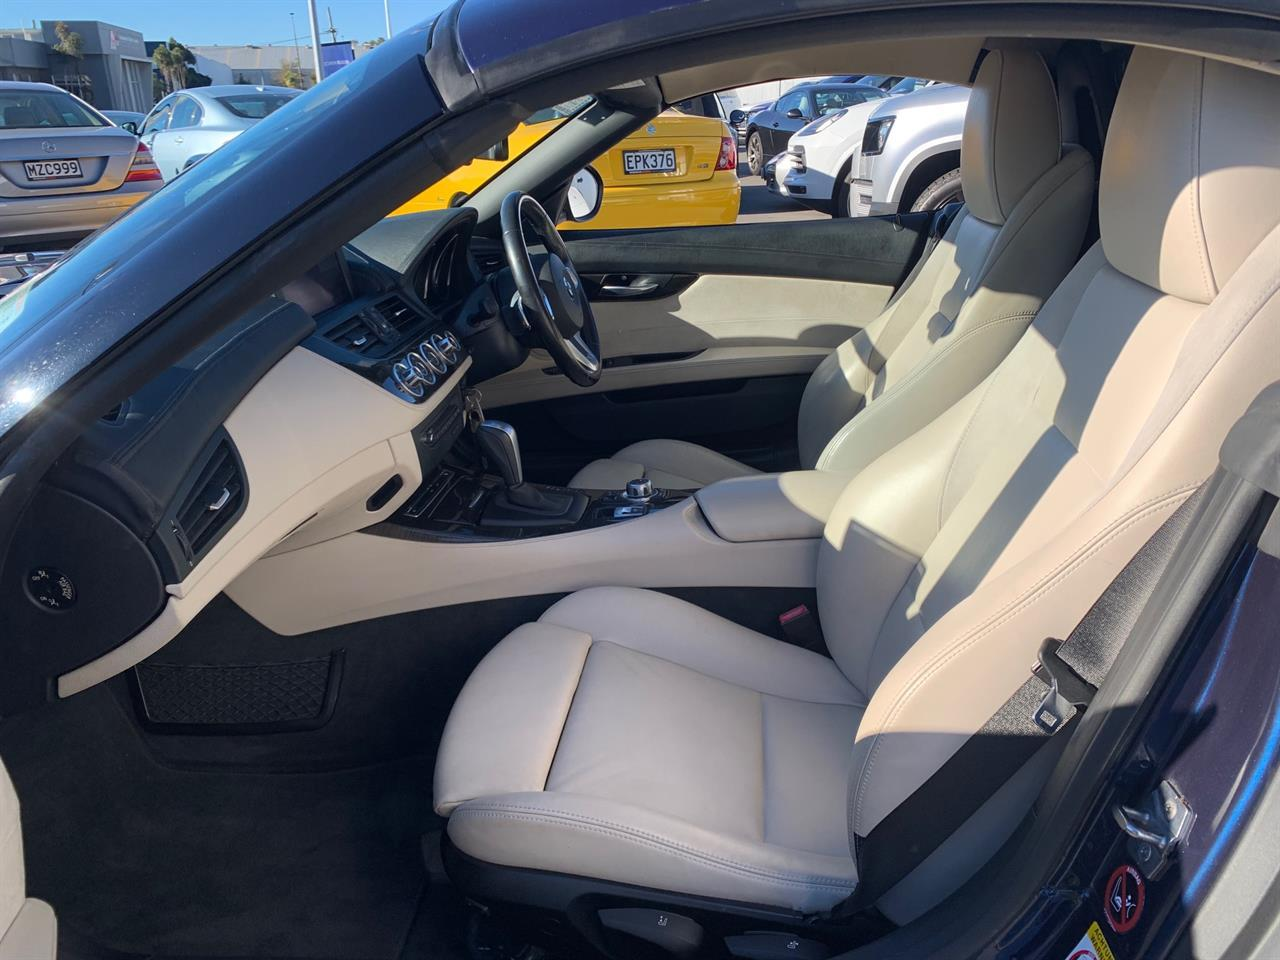 image-6, 2009 BMW Z4 SDrive Hardtop New Shape Convertible at Christchurch